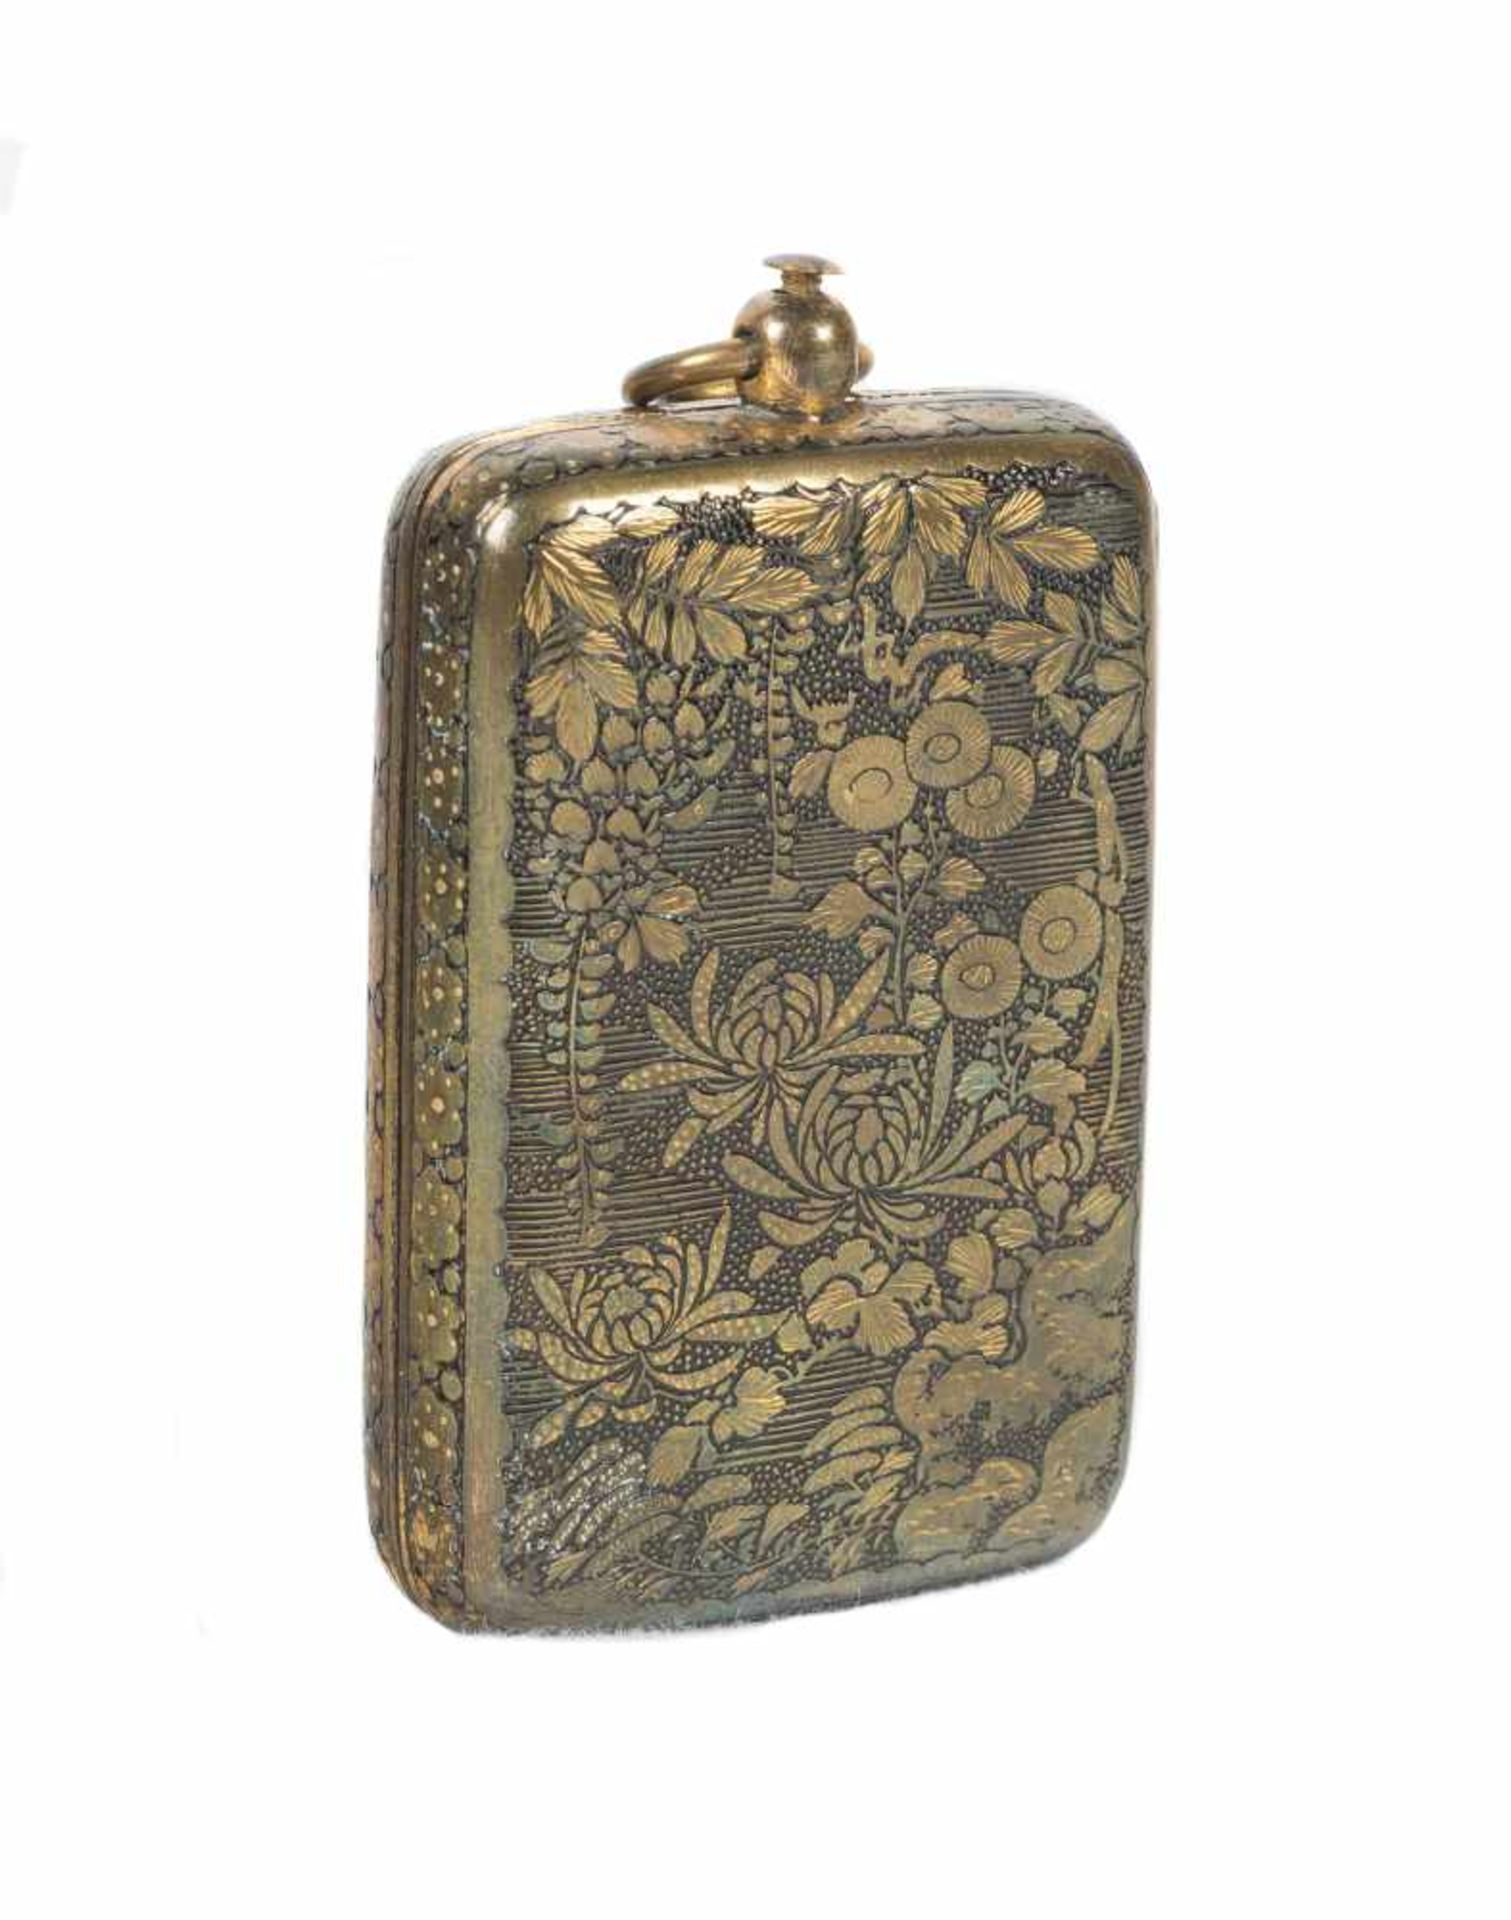 Los 59 - A Japanese inlaid iron Komai style miniature coin purse. Meiji period. 19th Century.6 x 3,5 cm.